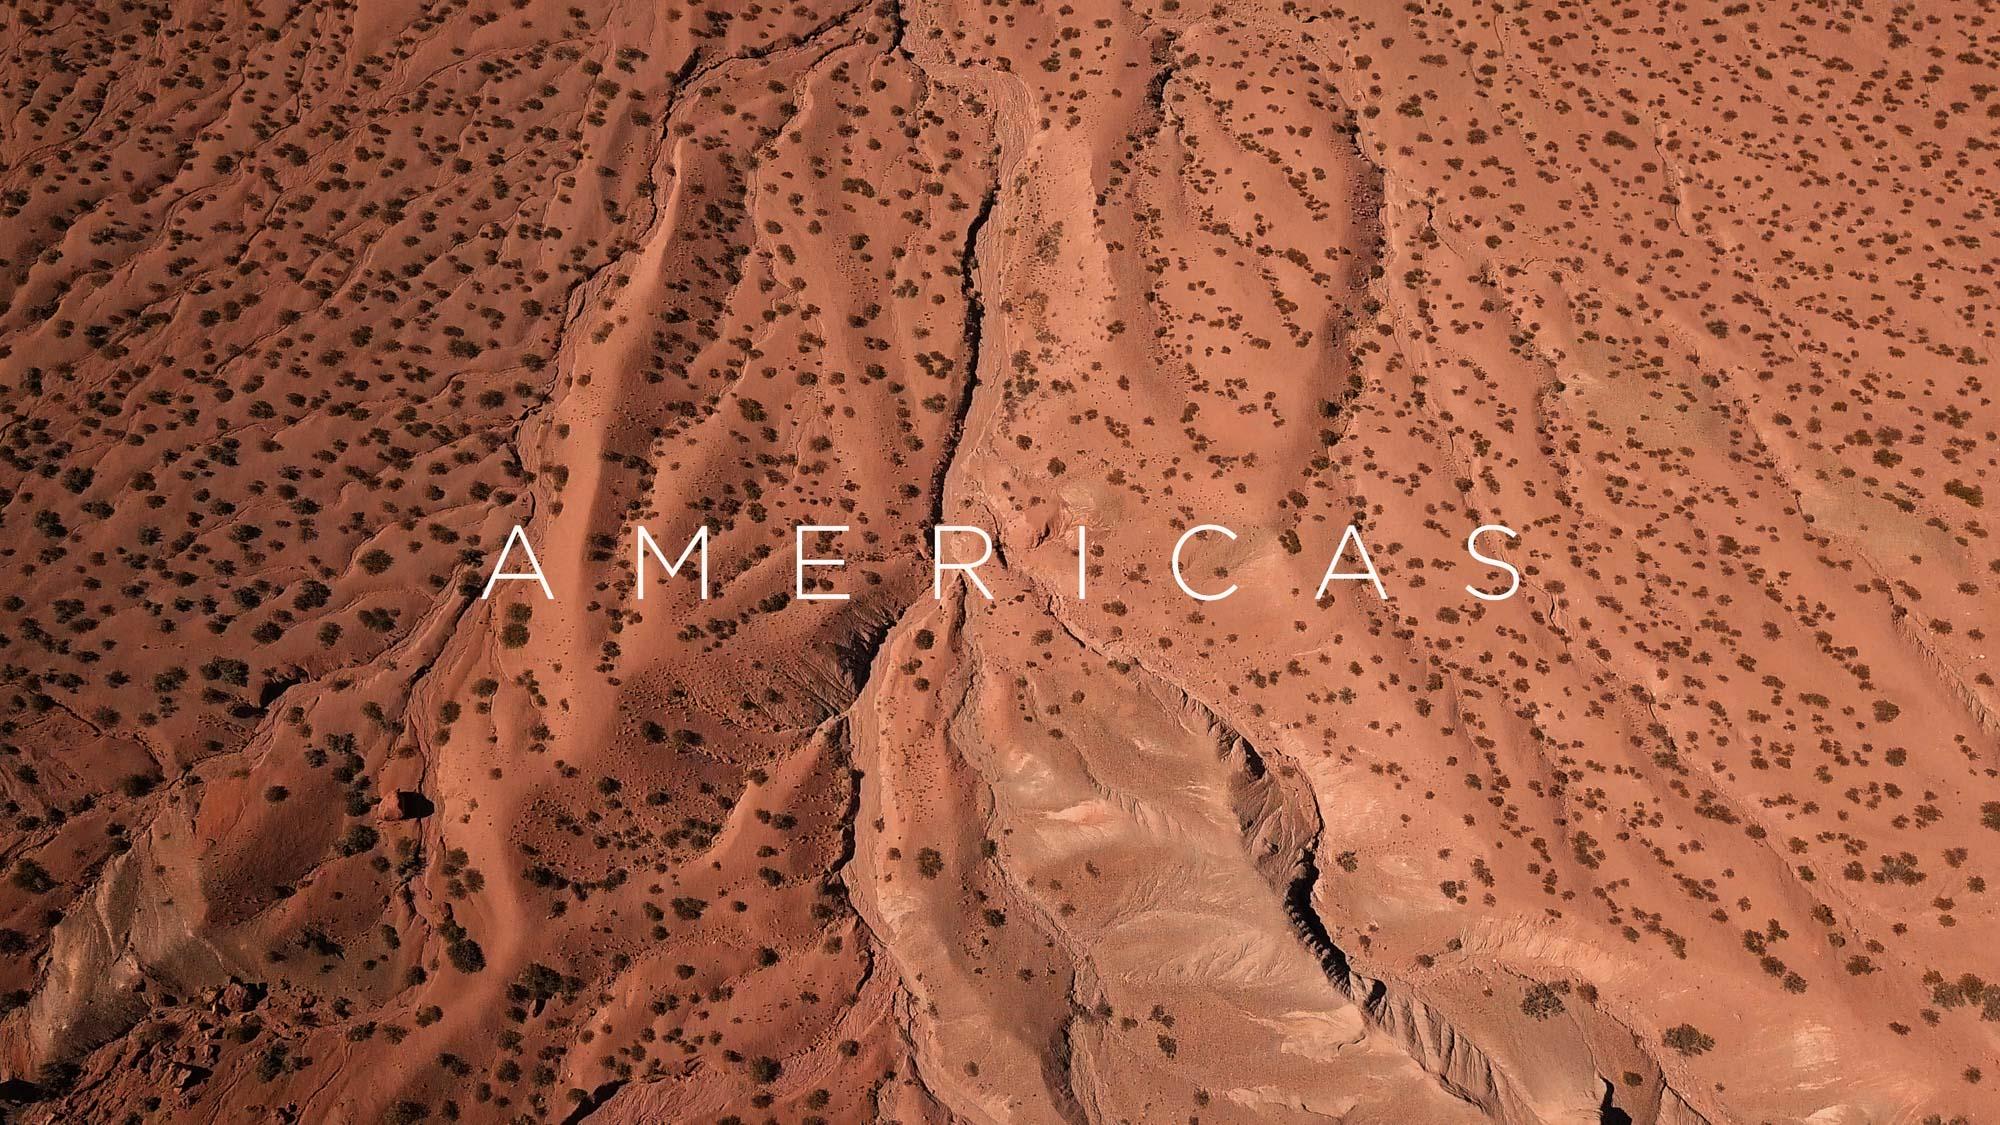 Alec Wren - Americas